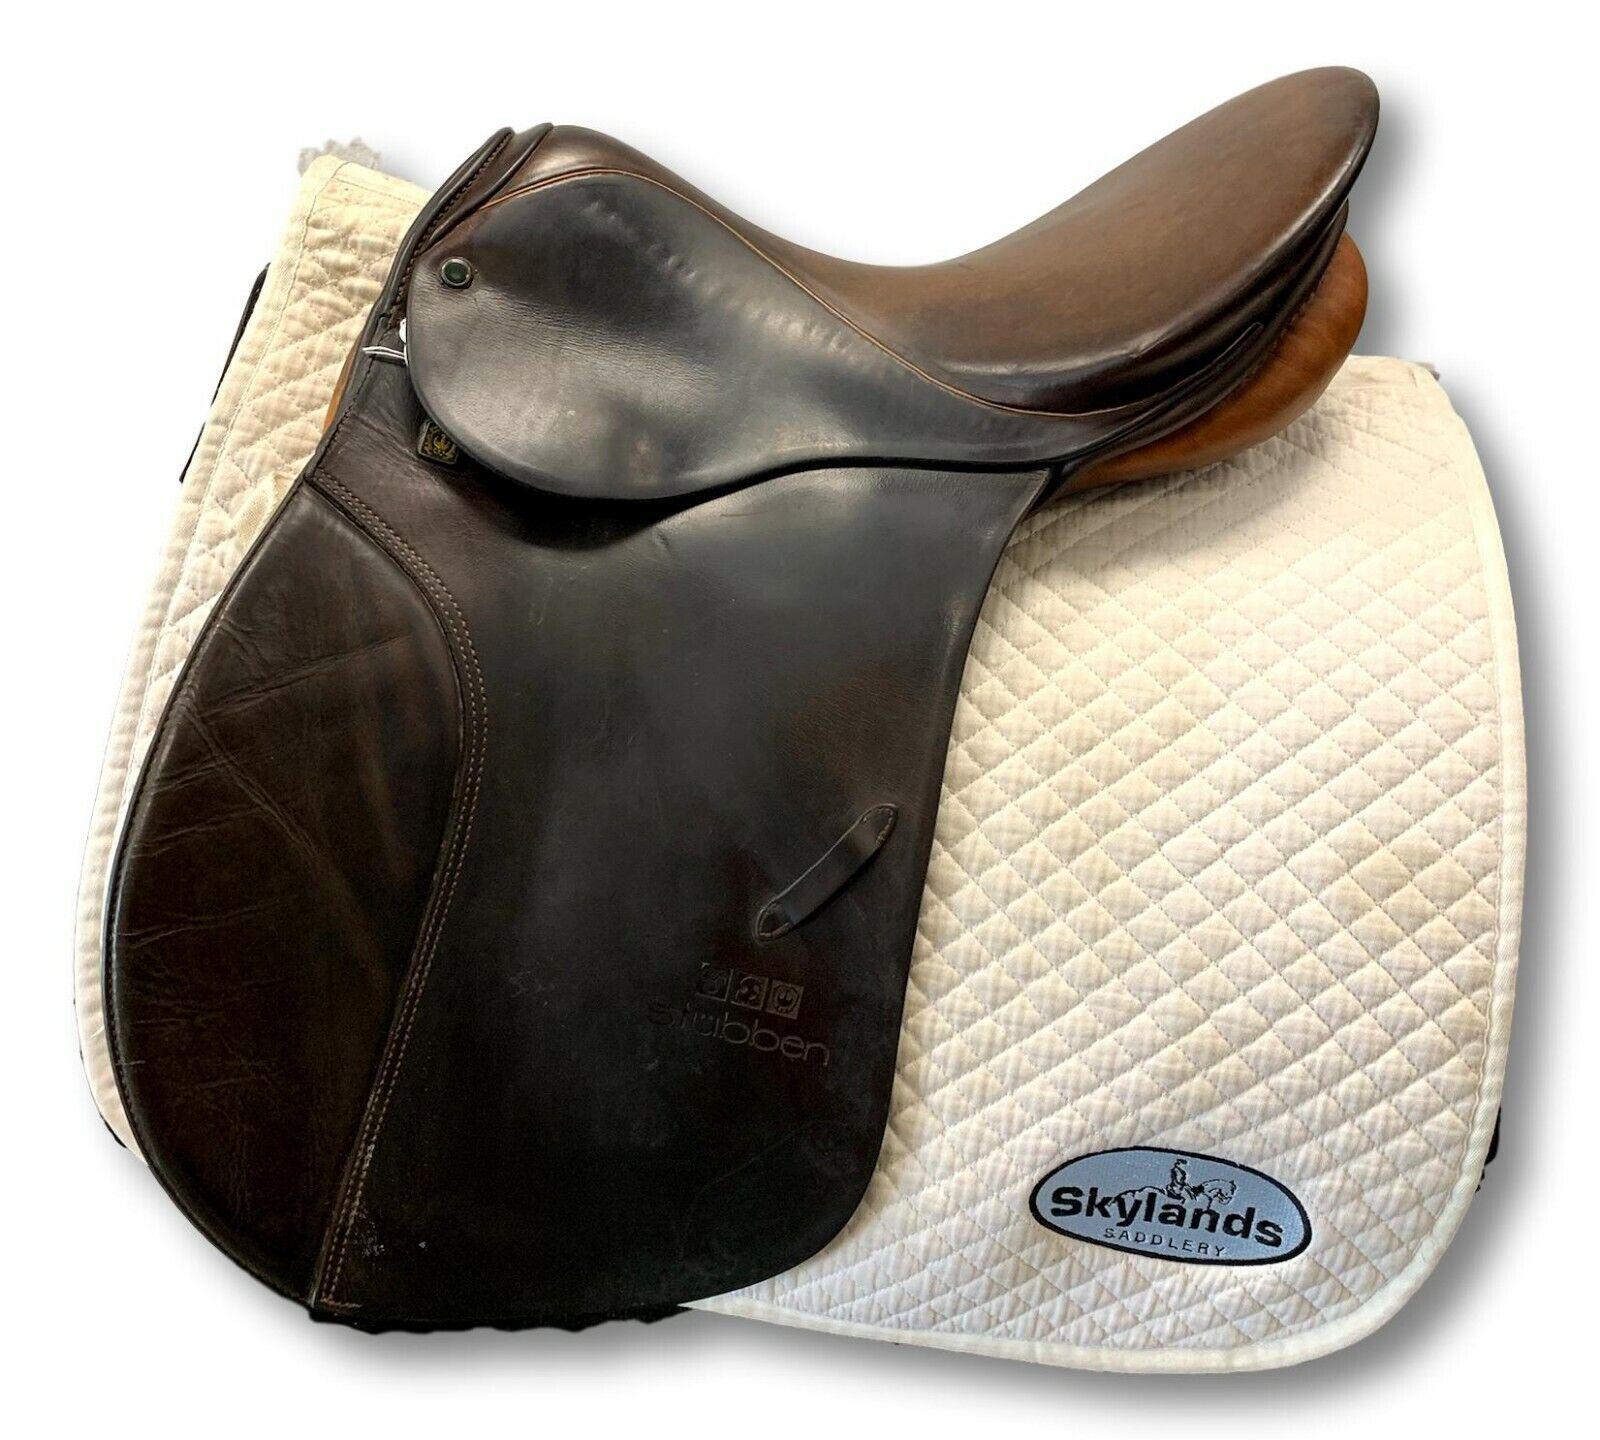 Price Dropped    Used Stubben Siegfried VSD Saddle  Diuominiione  17''  Marronee